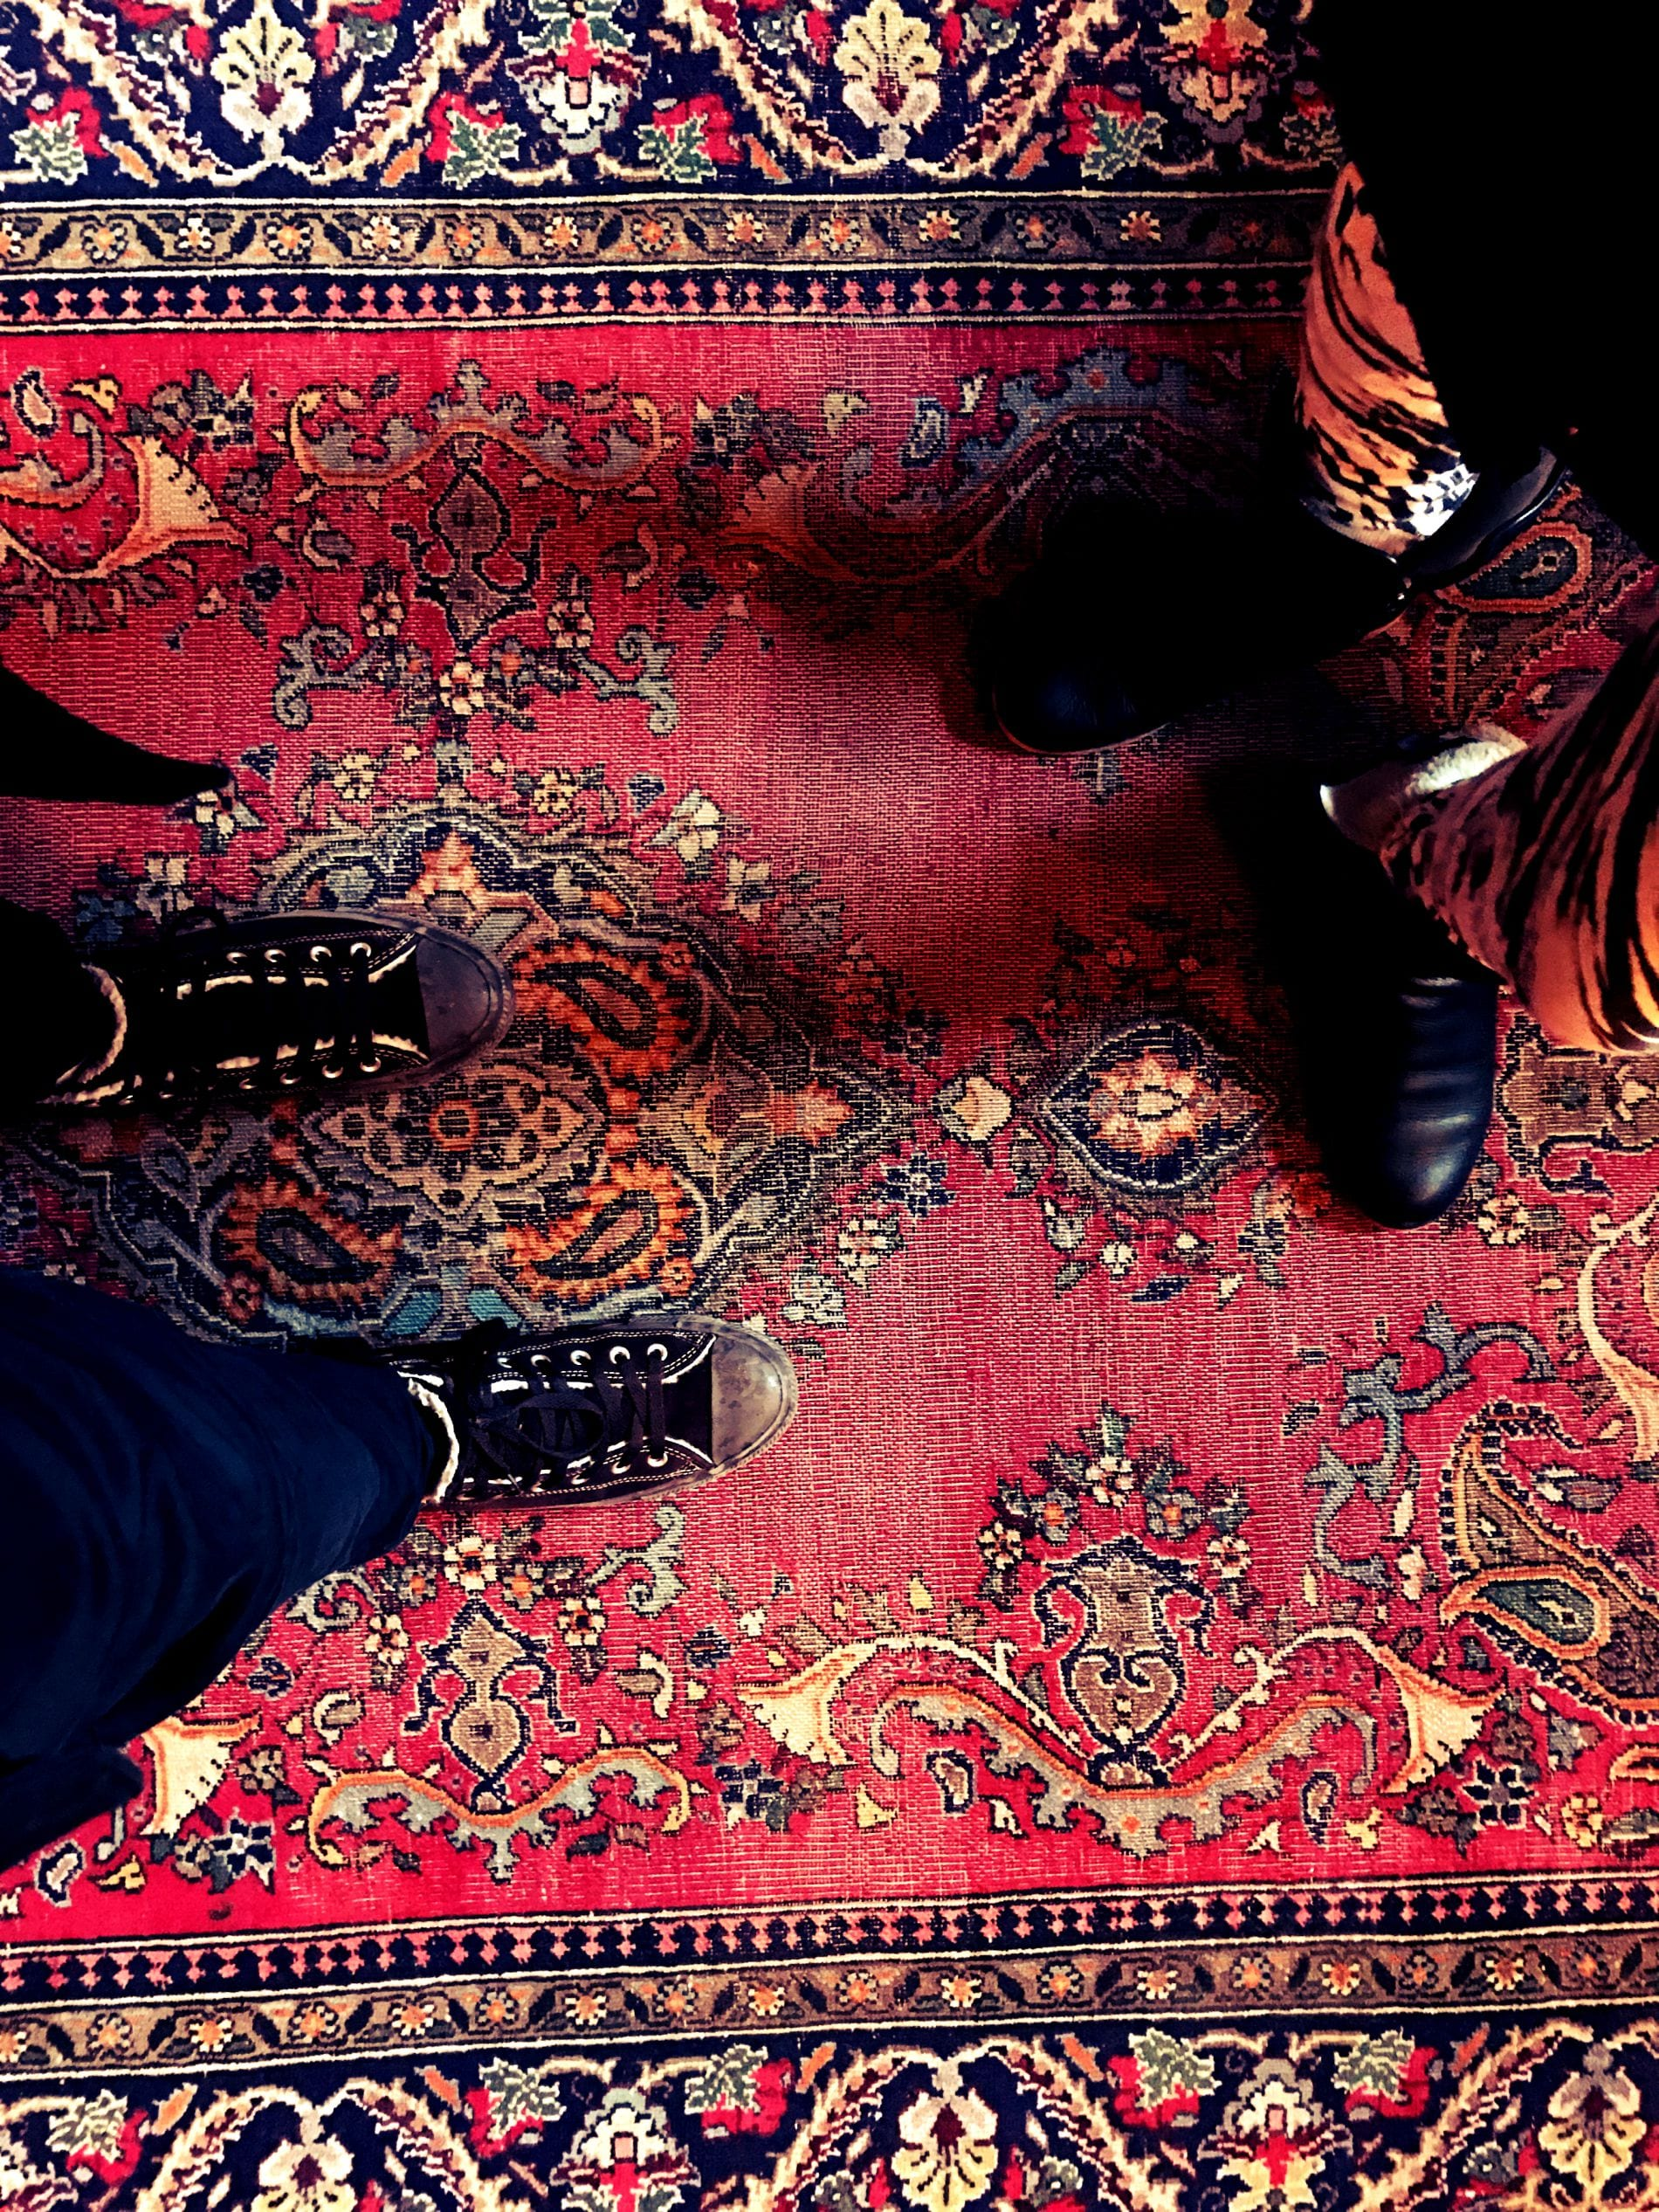 sherlock-holmes-museum-london-teppichboden